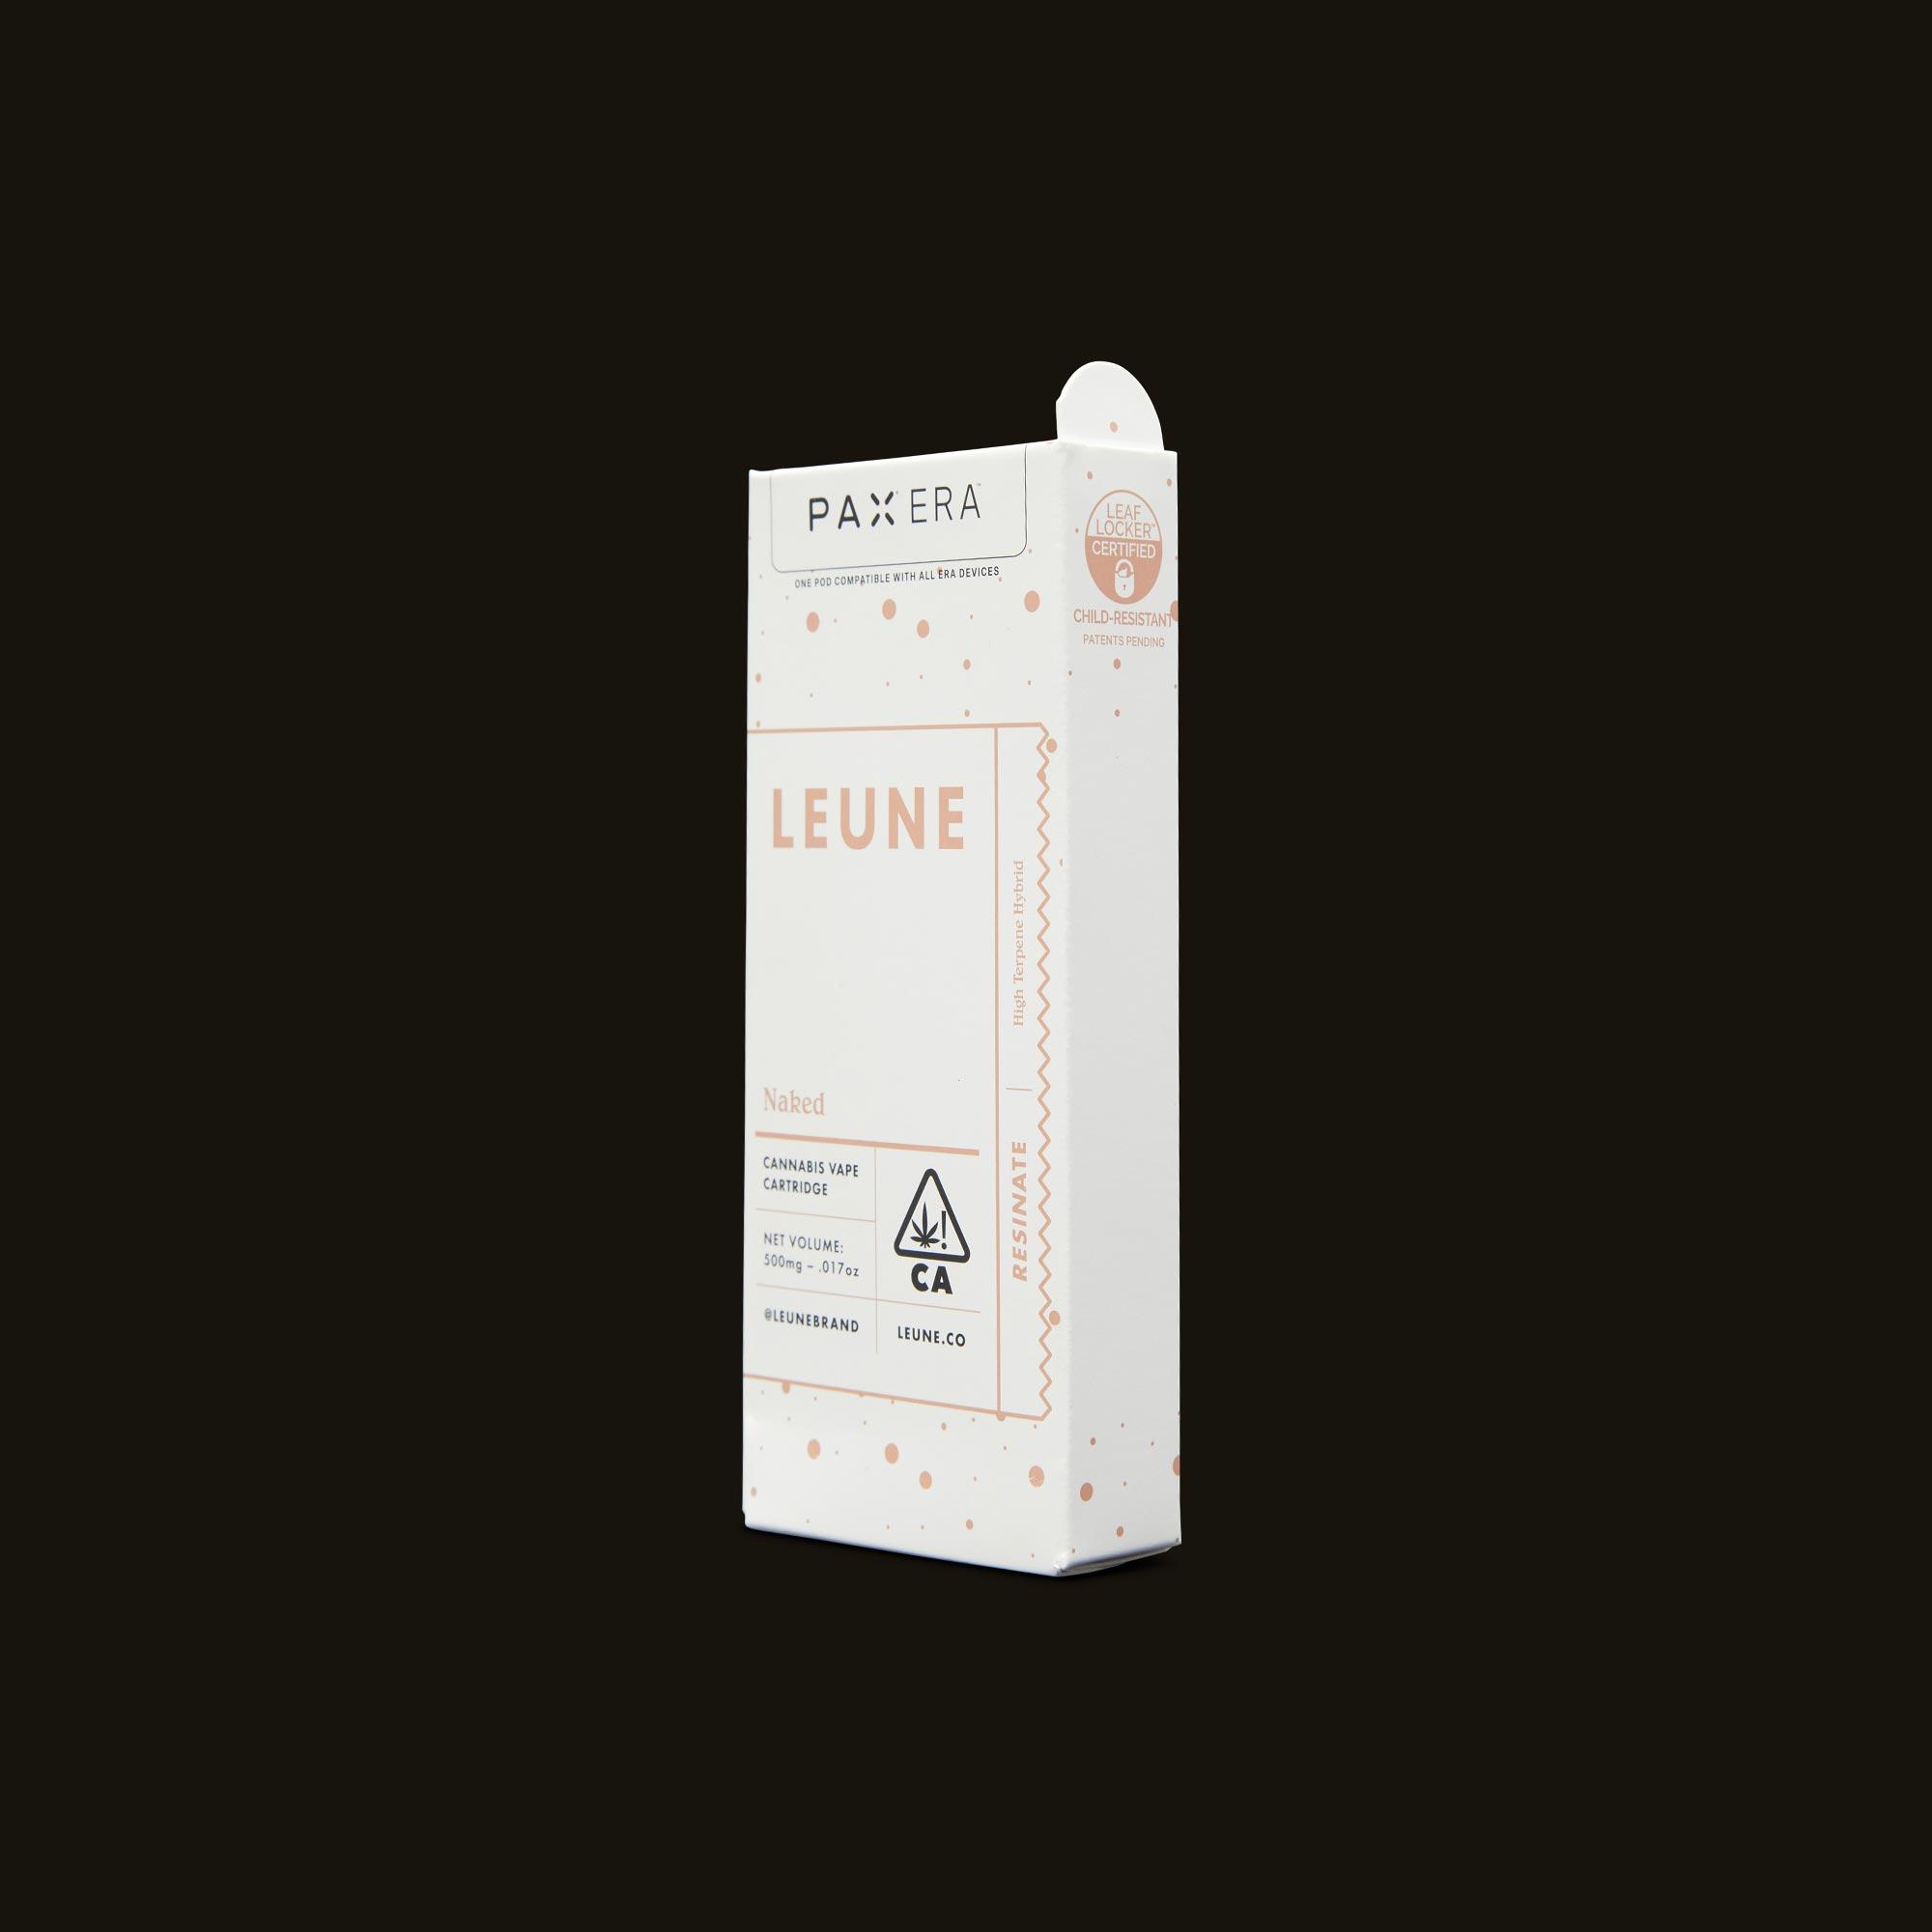 LEUNE Naked Tangie Live Resin PAX Era Pod Side Packaging